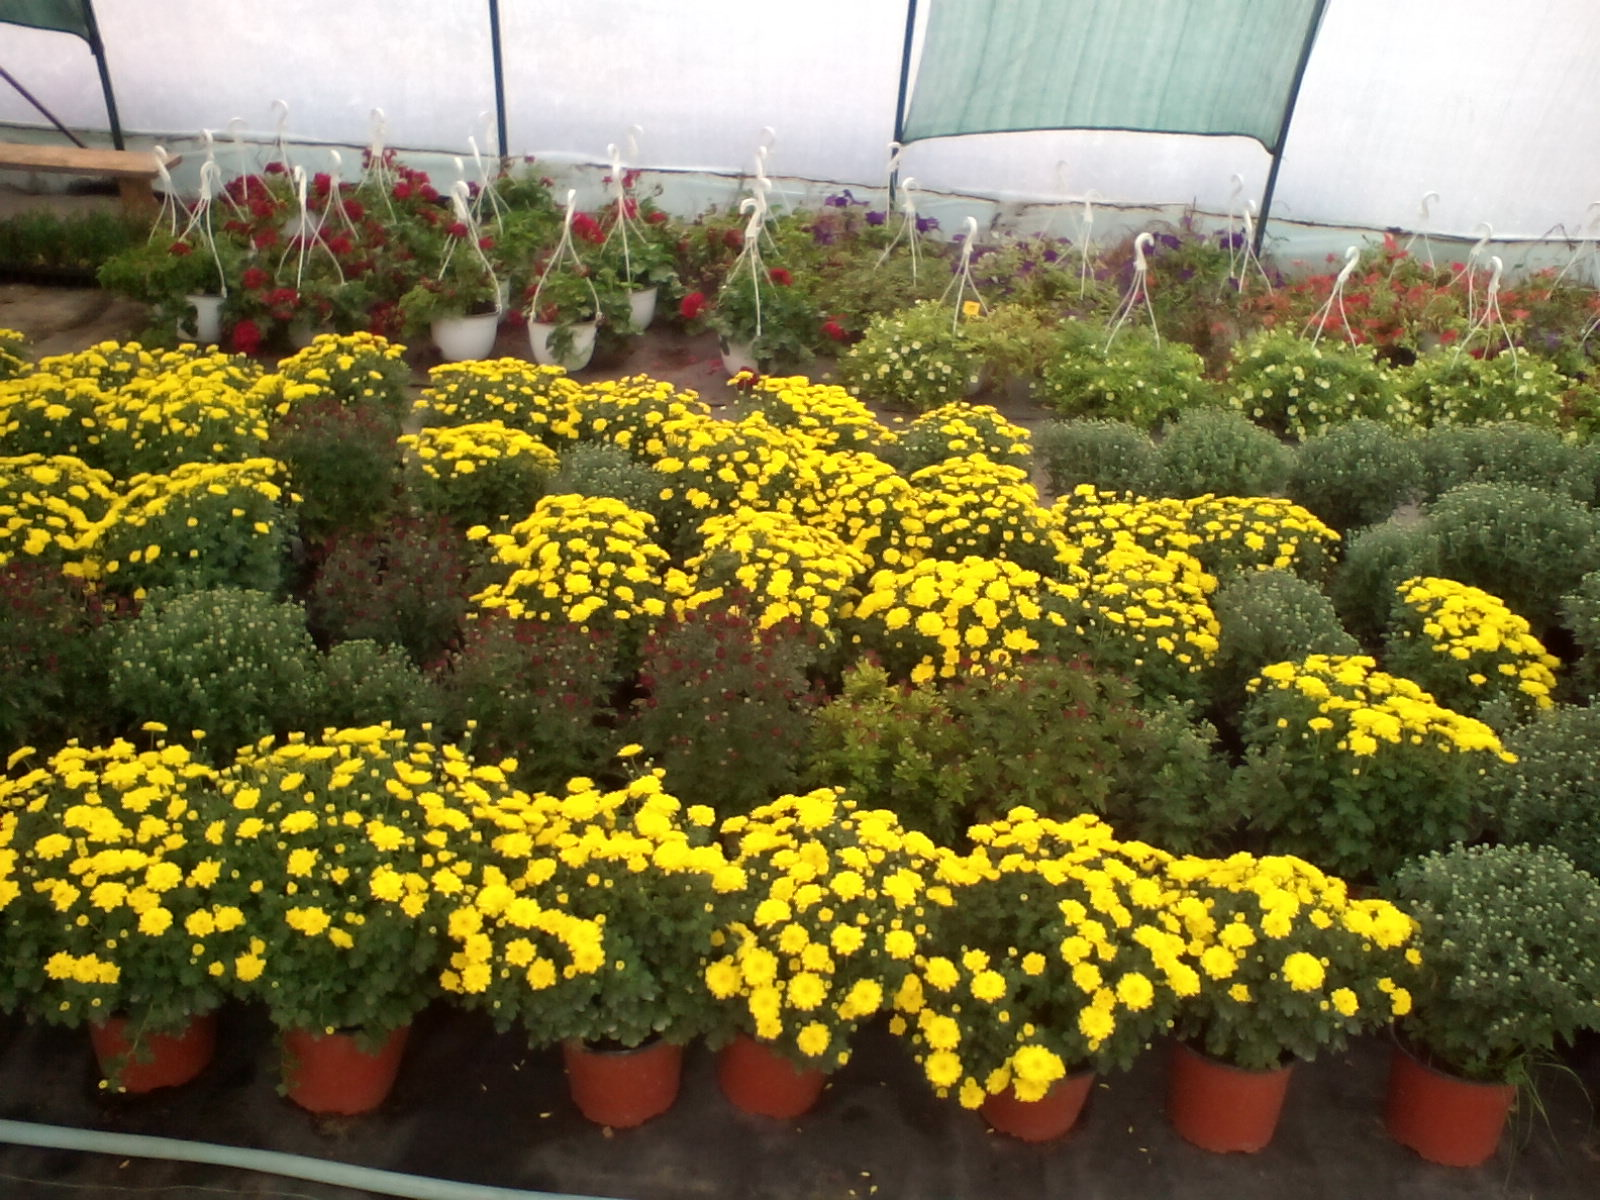 labirint-garden-tuia-tuia-radauti-marginea-plante-ornamentale-depozit-flori-14